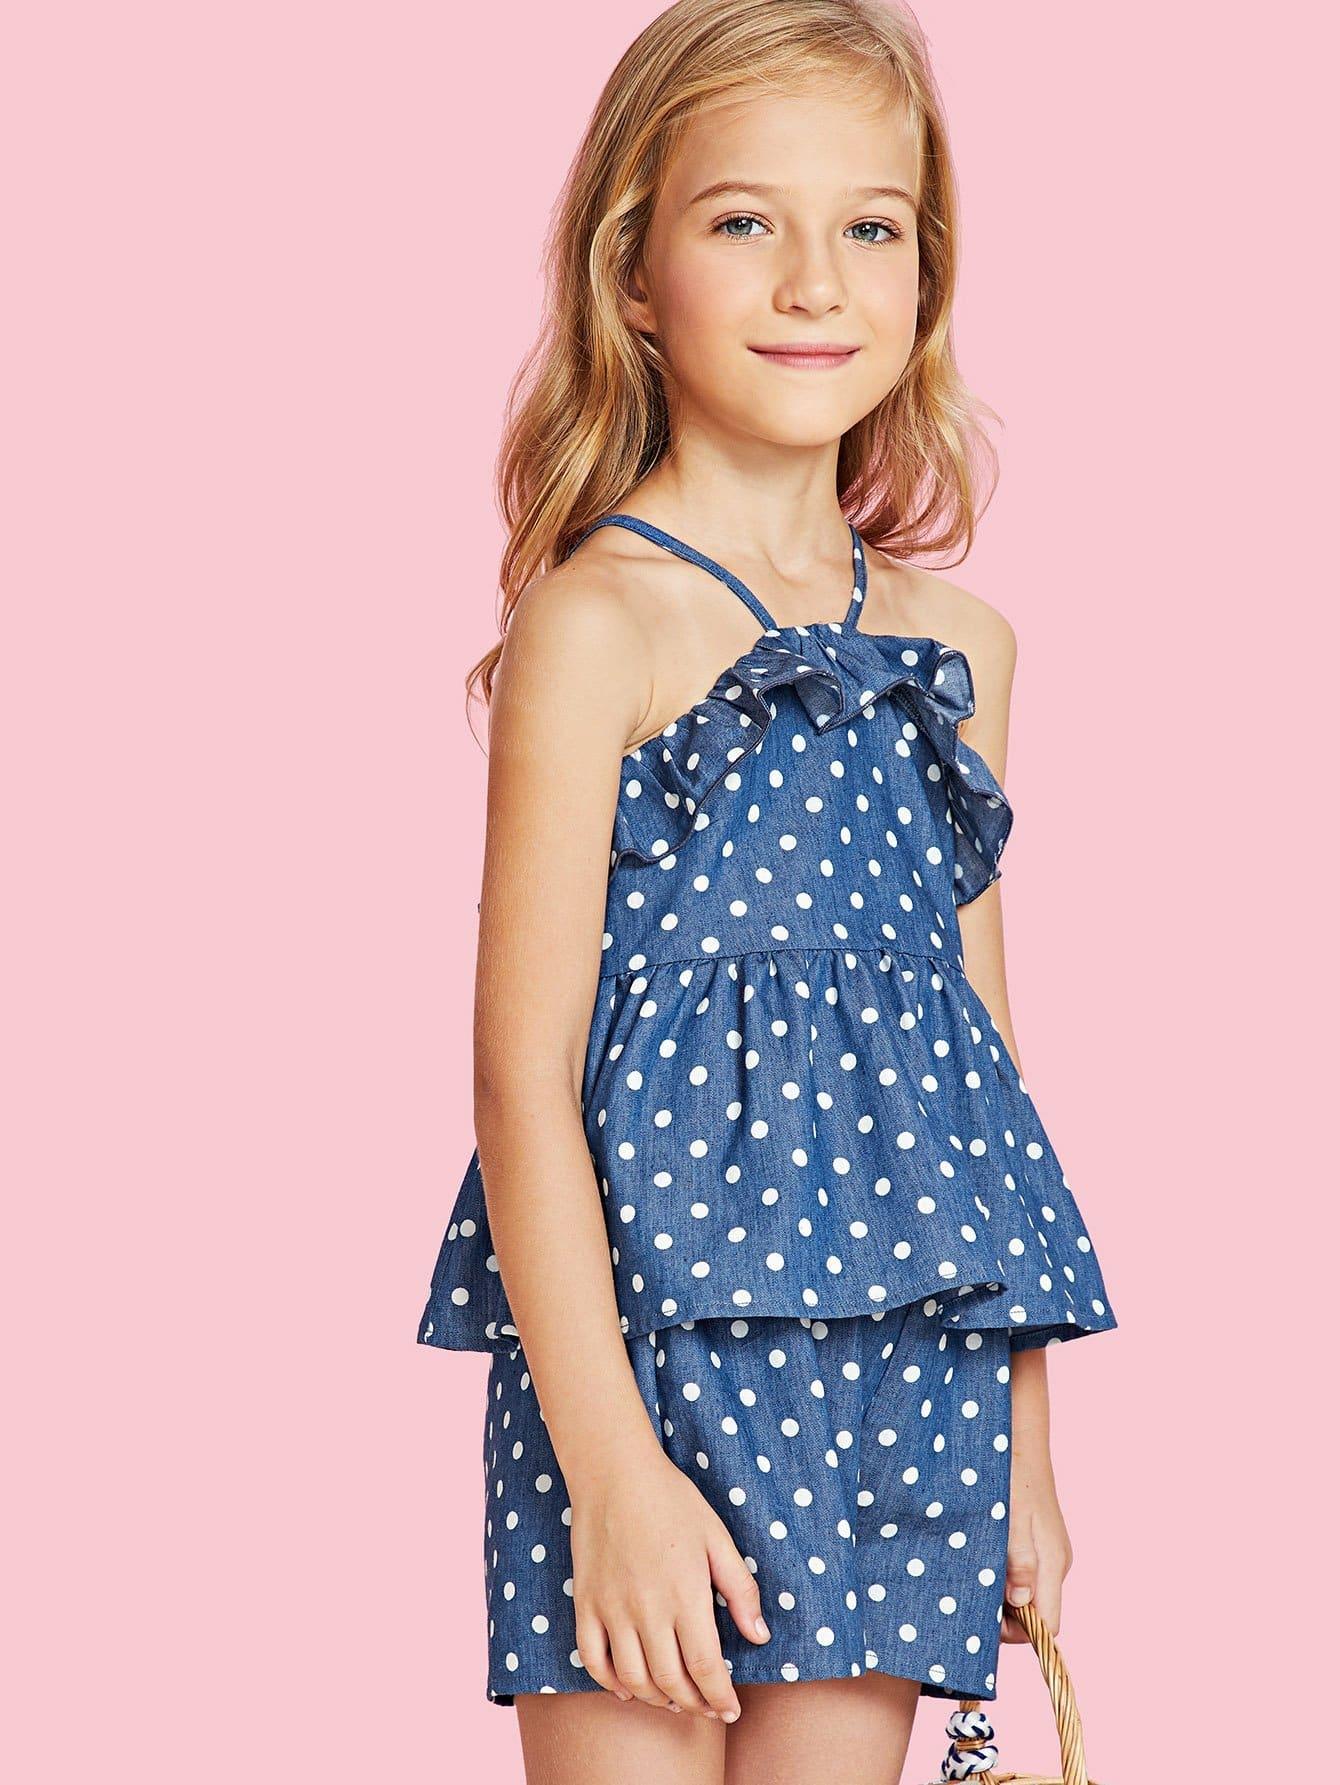 Polka Dot Ruffle Cami Top & Shorts Co-Ord polka dot wrap cami top